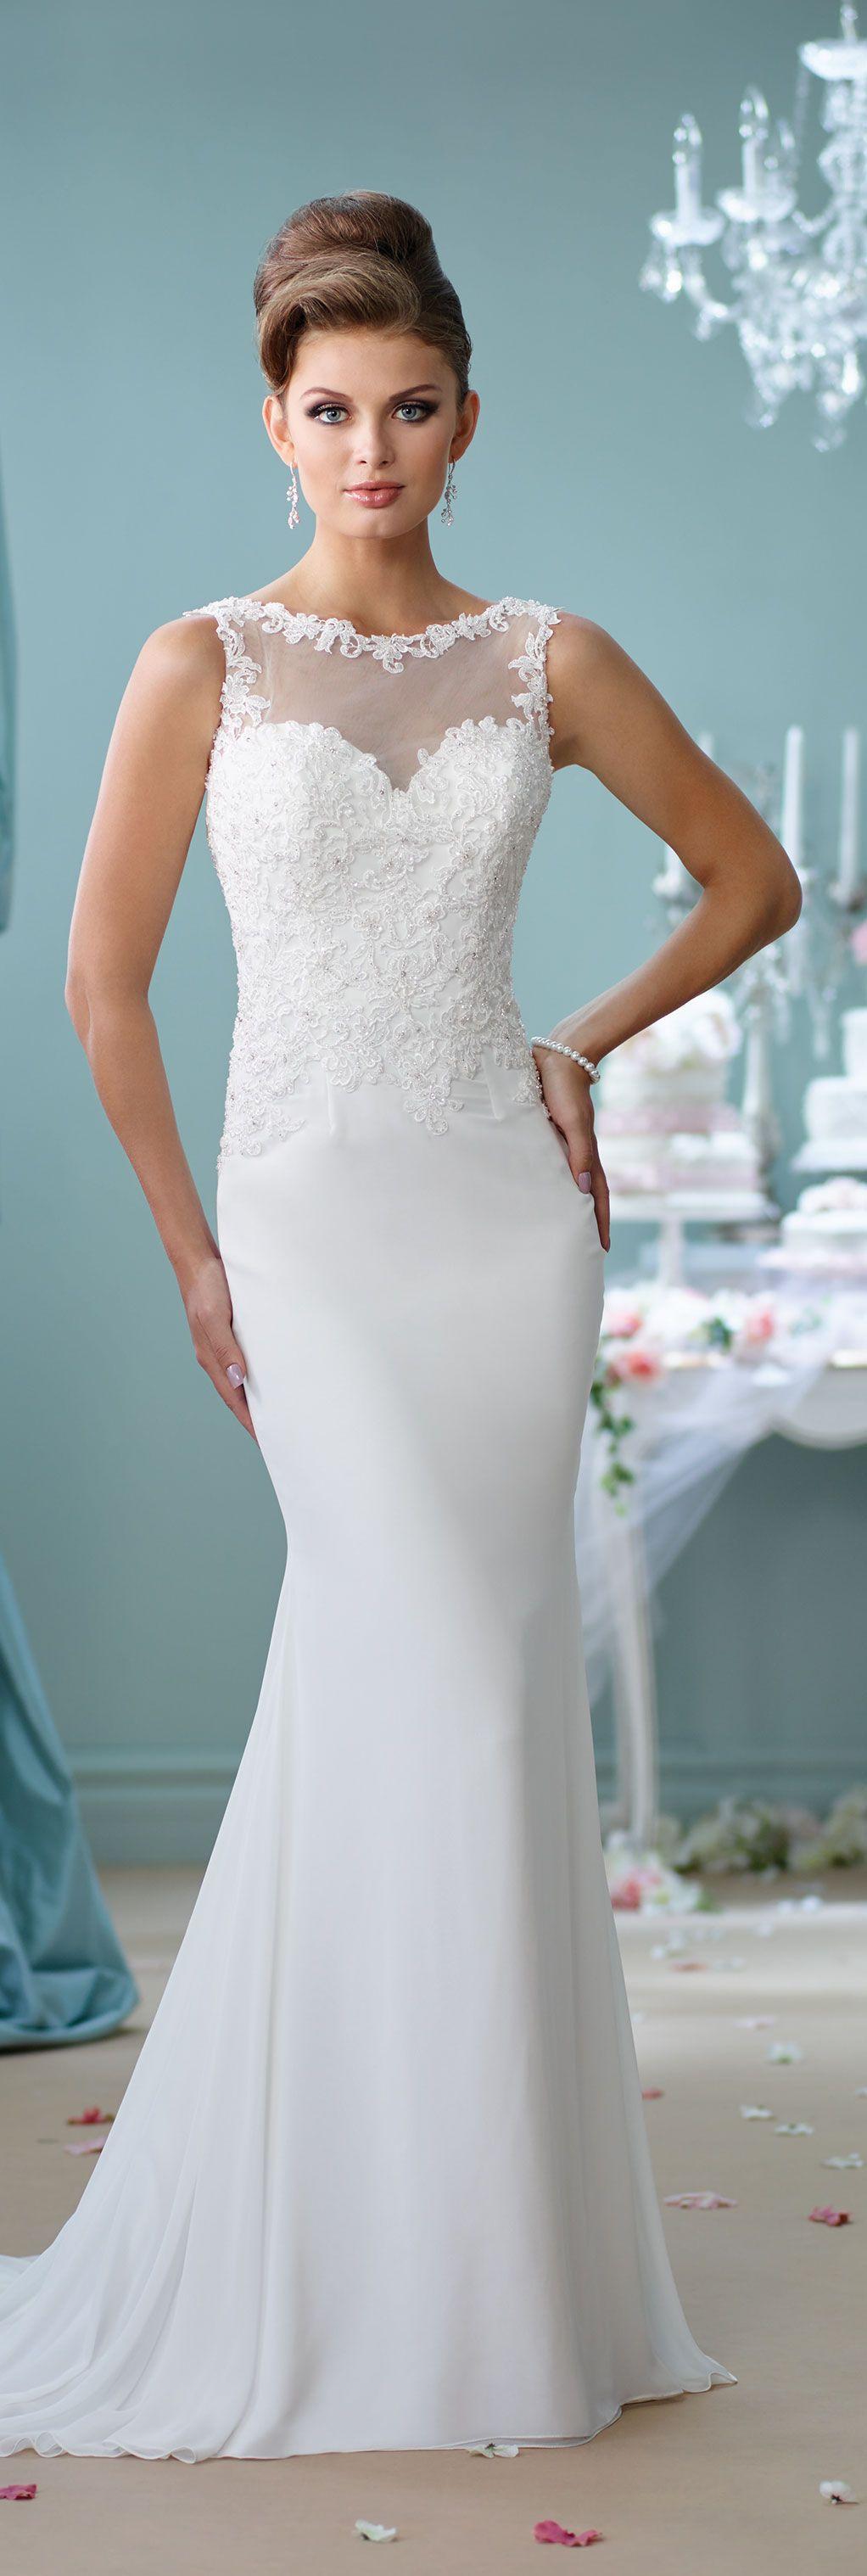 Modern wedding dresses by mon cheri wed pinterest wedding